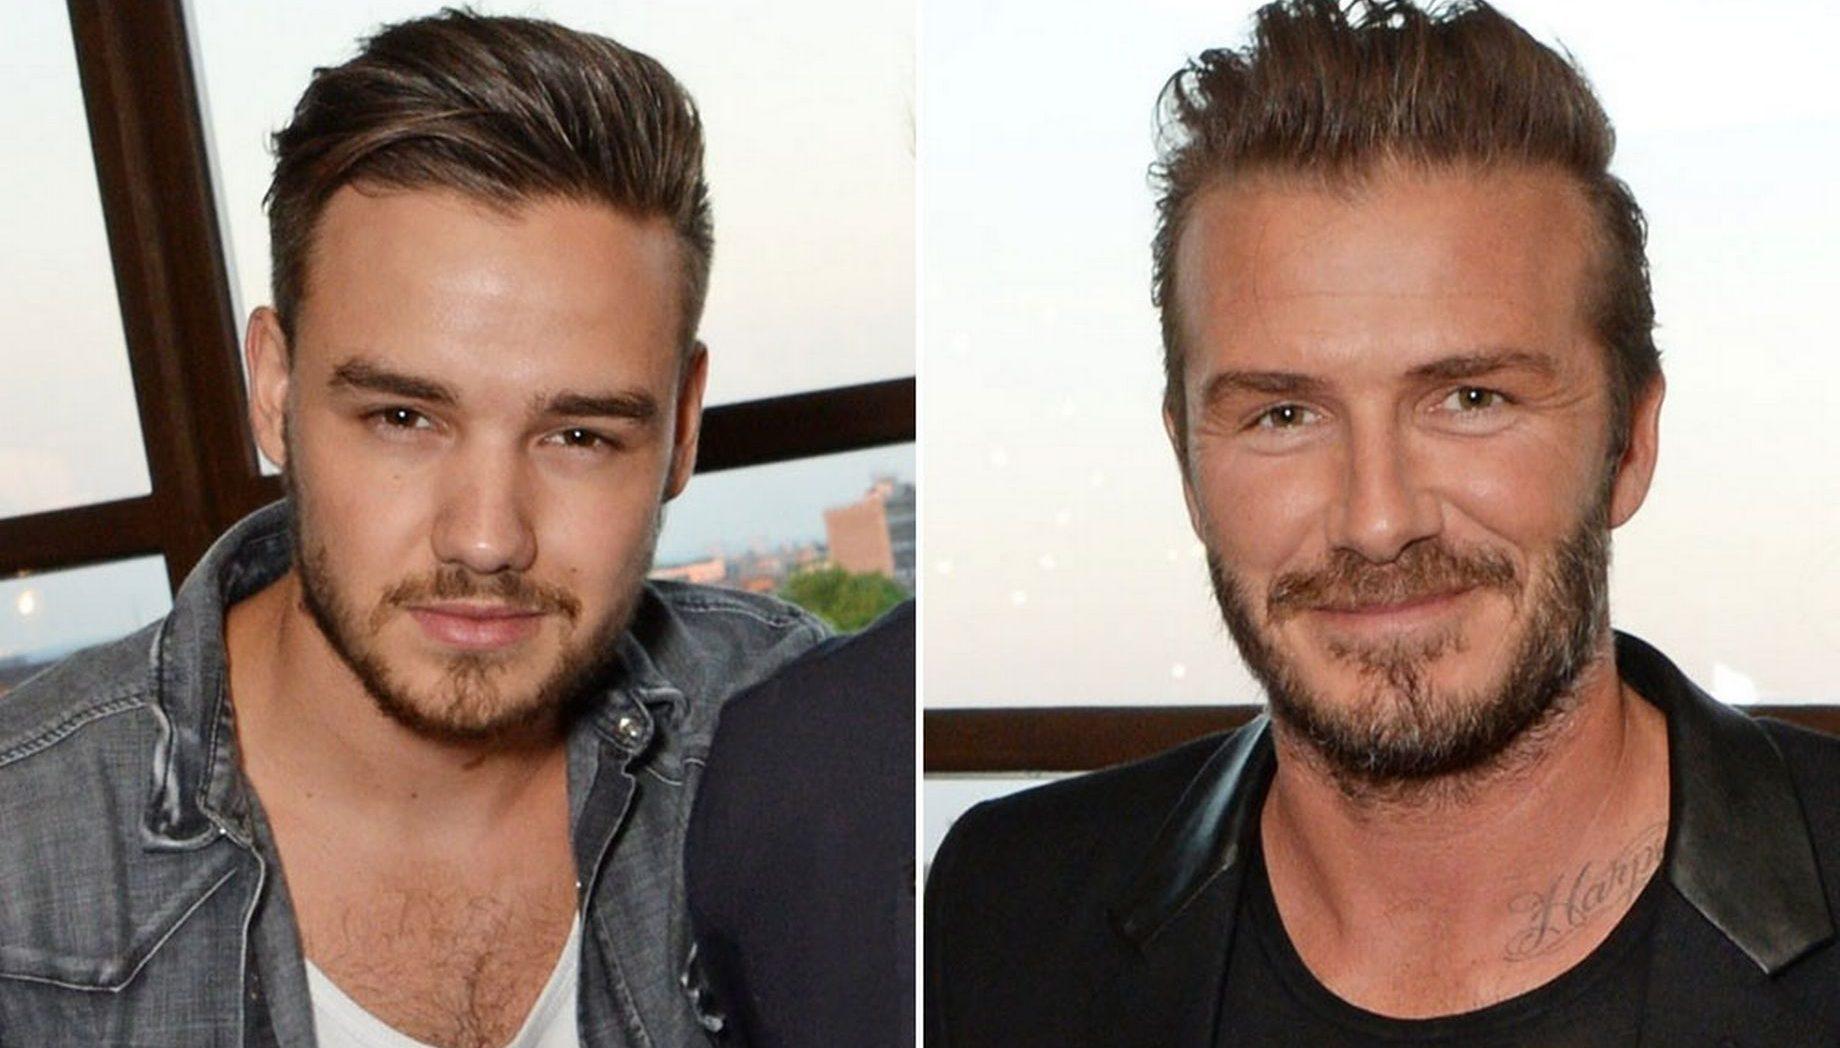 David Beckham ve Liam Payne, Gazetede Onur Mesajları Verdi!